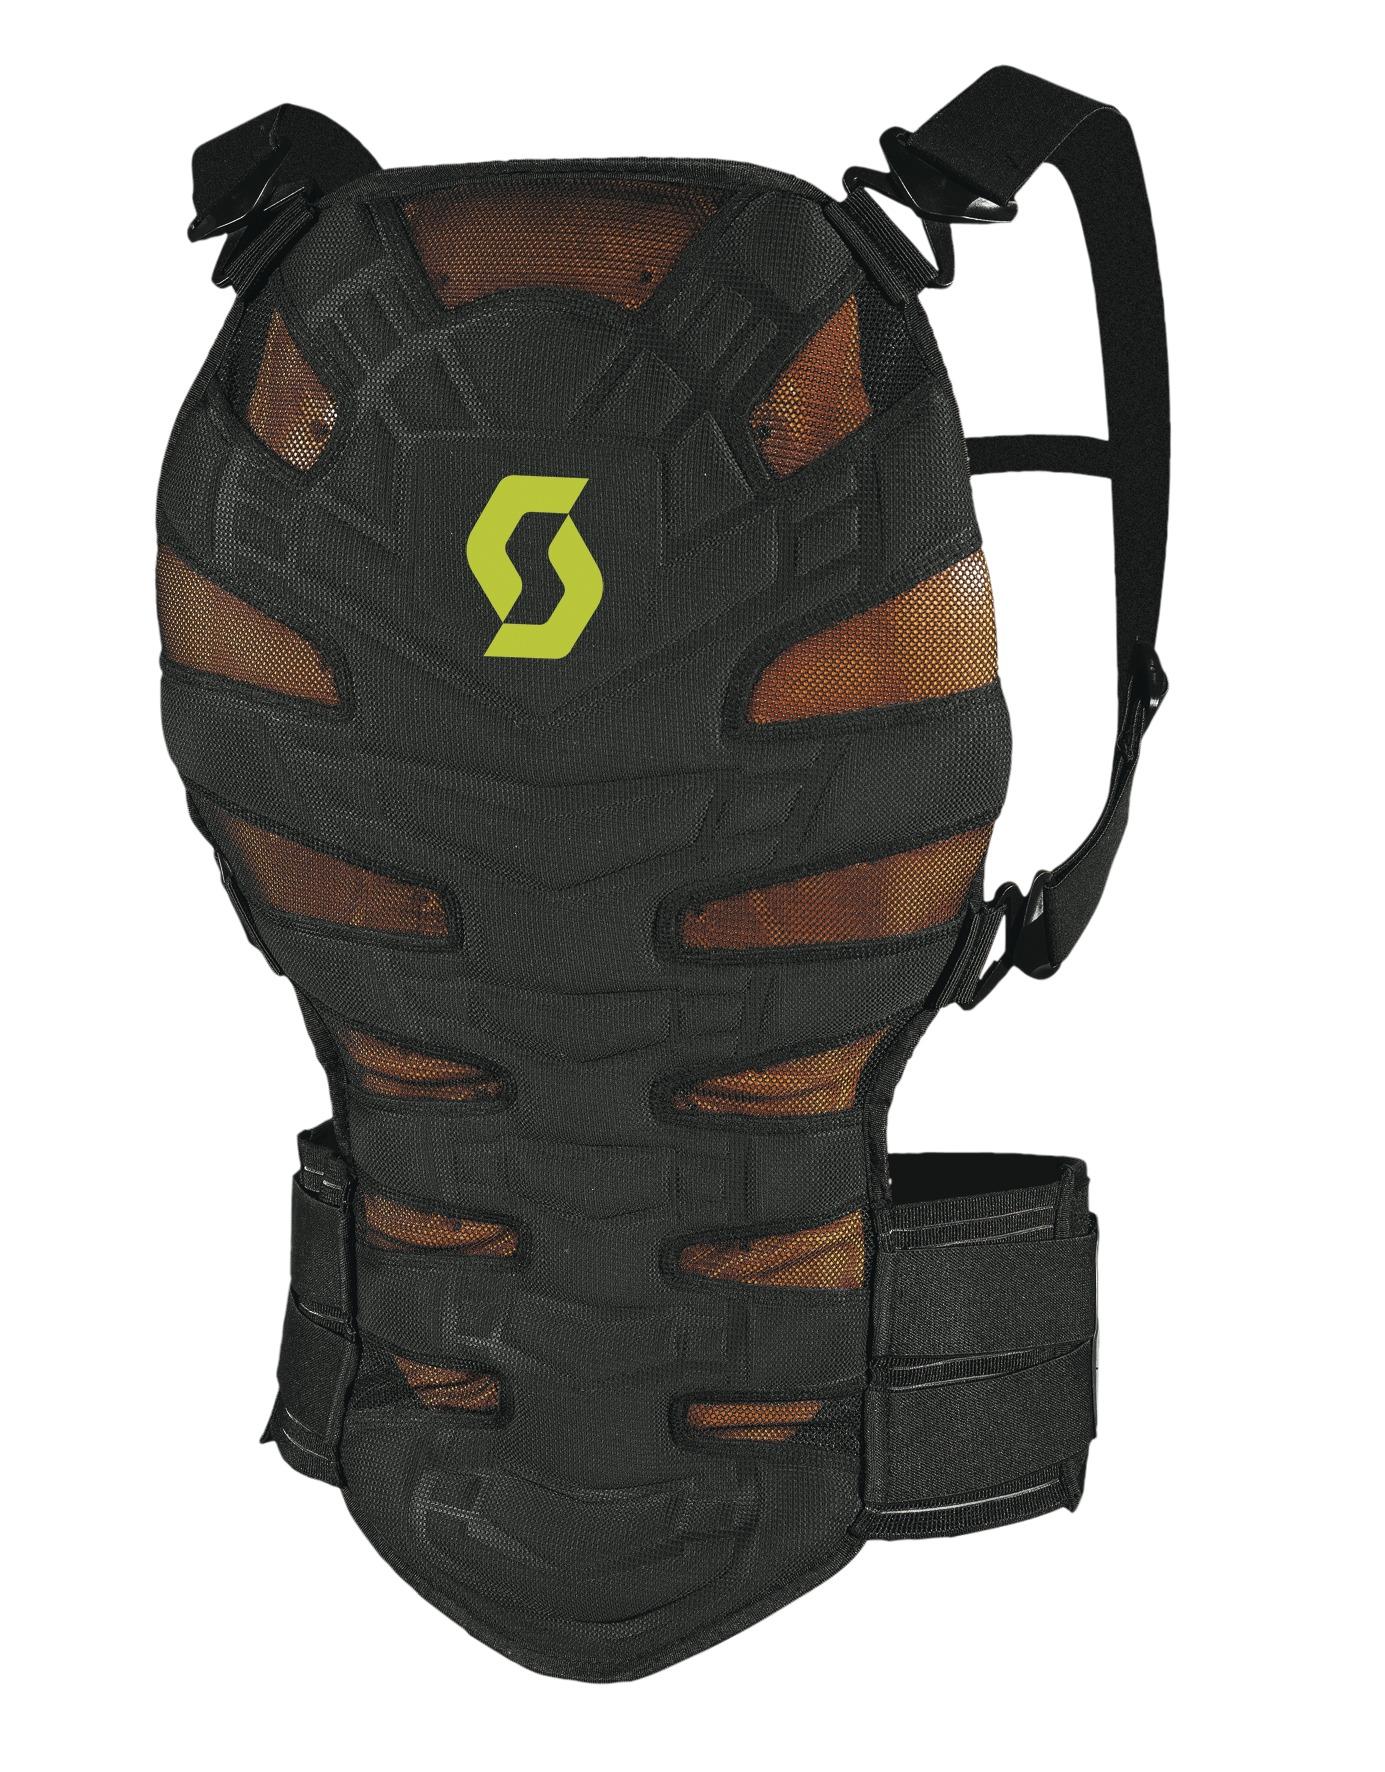 SCOTT – Soft CR II Back Protector Image